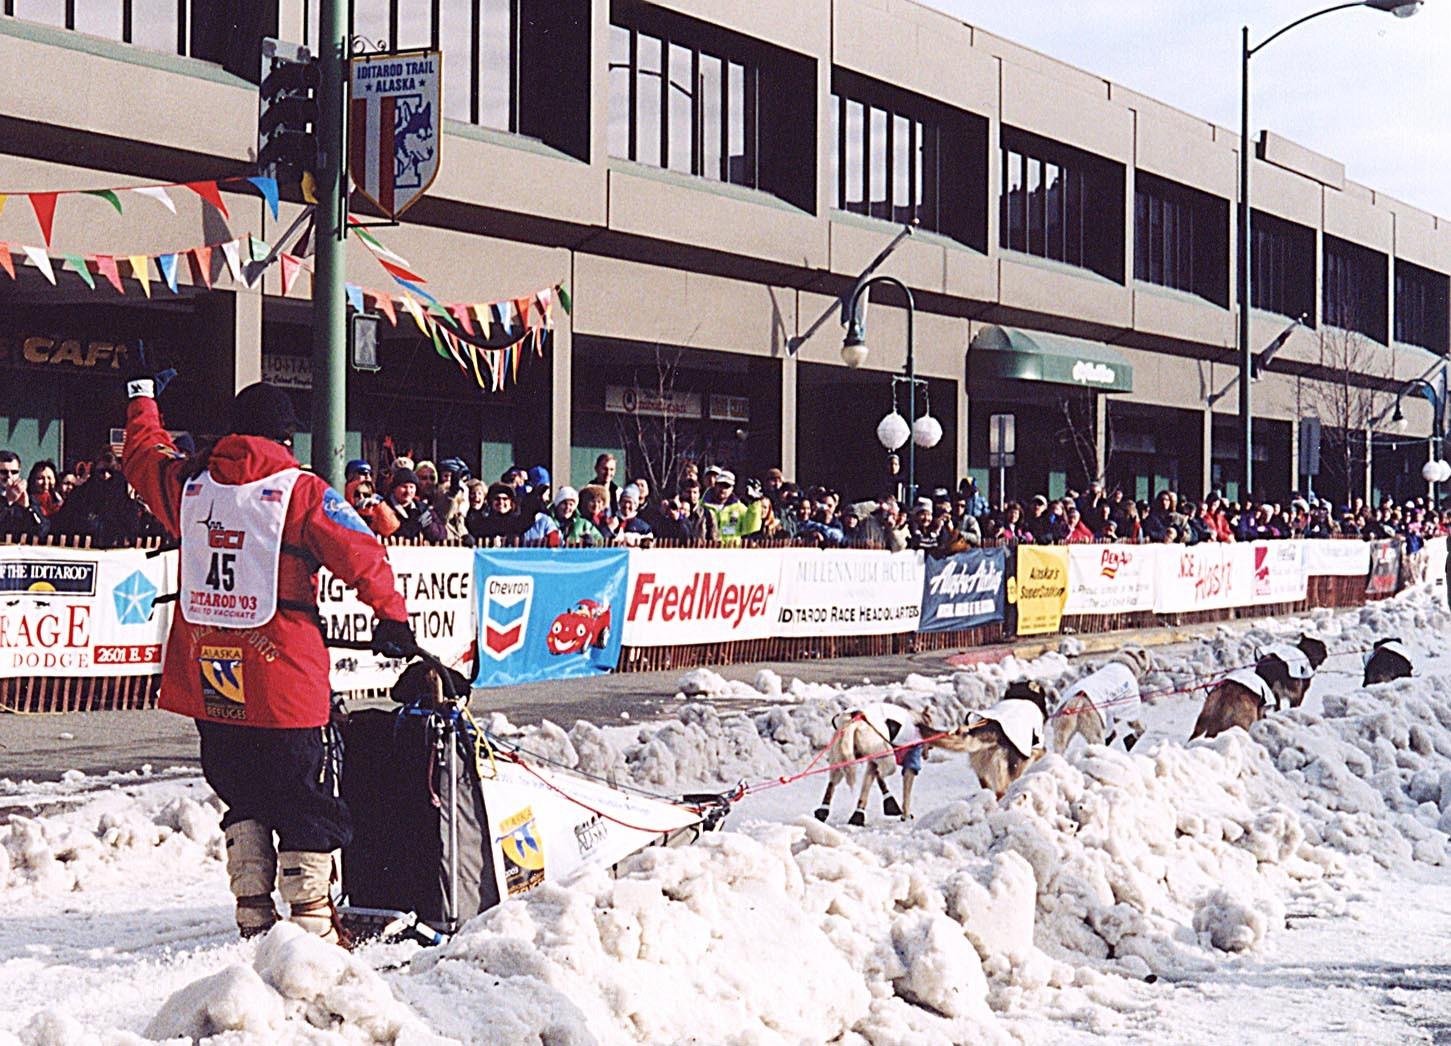 2003 Iditarod start in Anchorage Aliy Zirkle